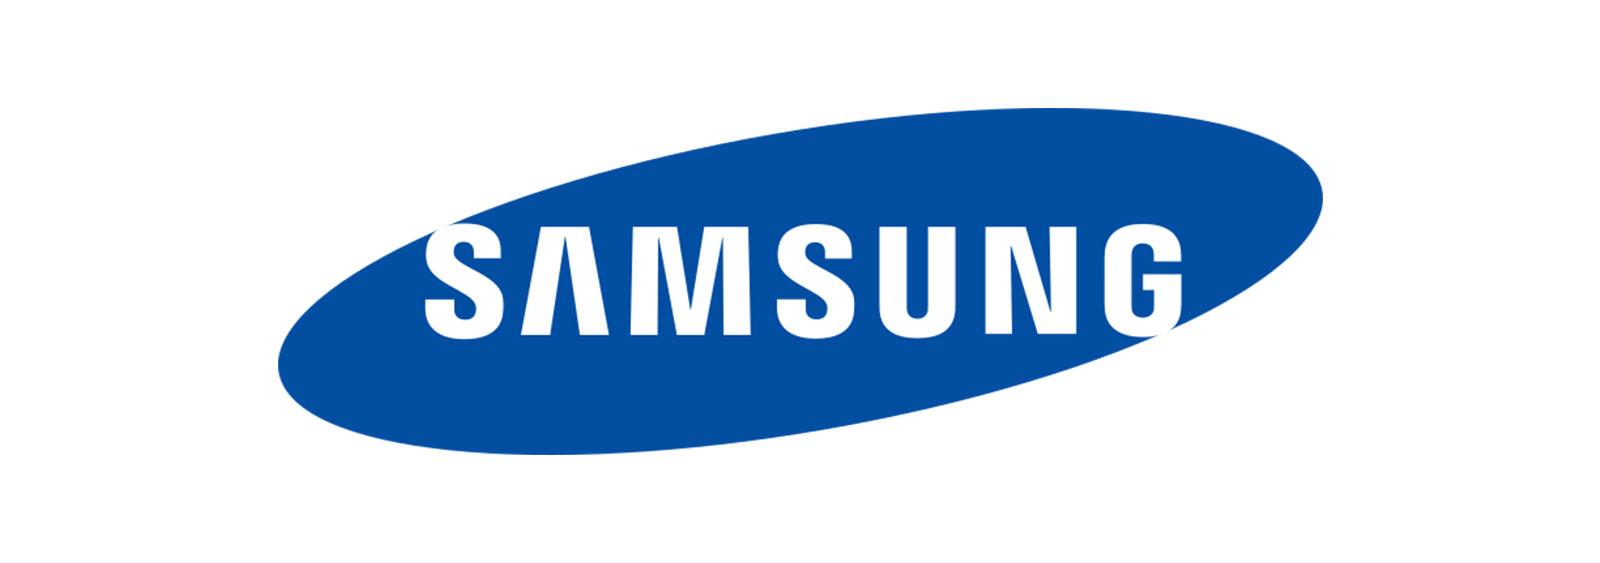 Top des ventes Samsung en boutique Phone Doctor